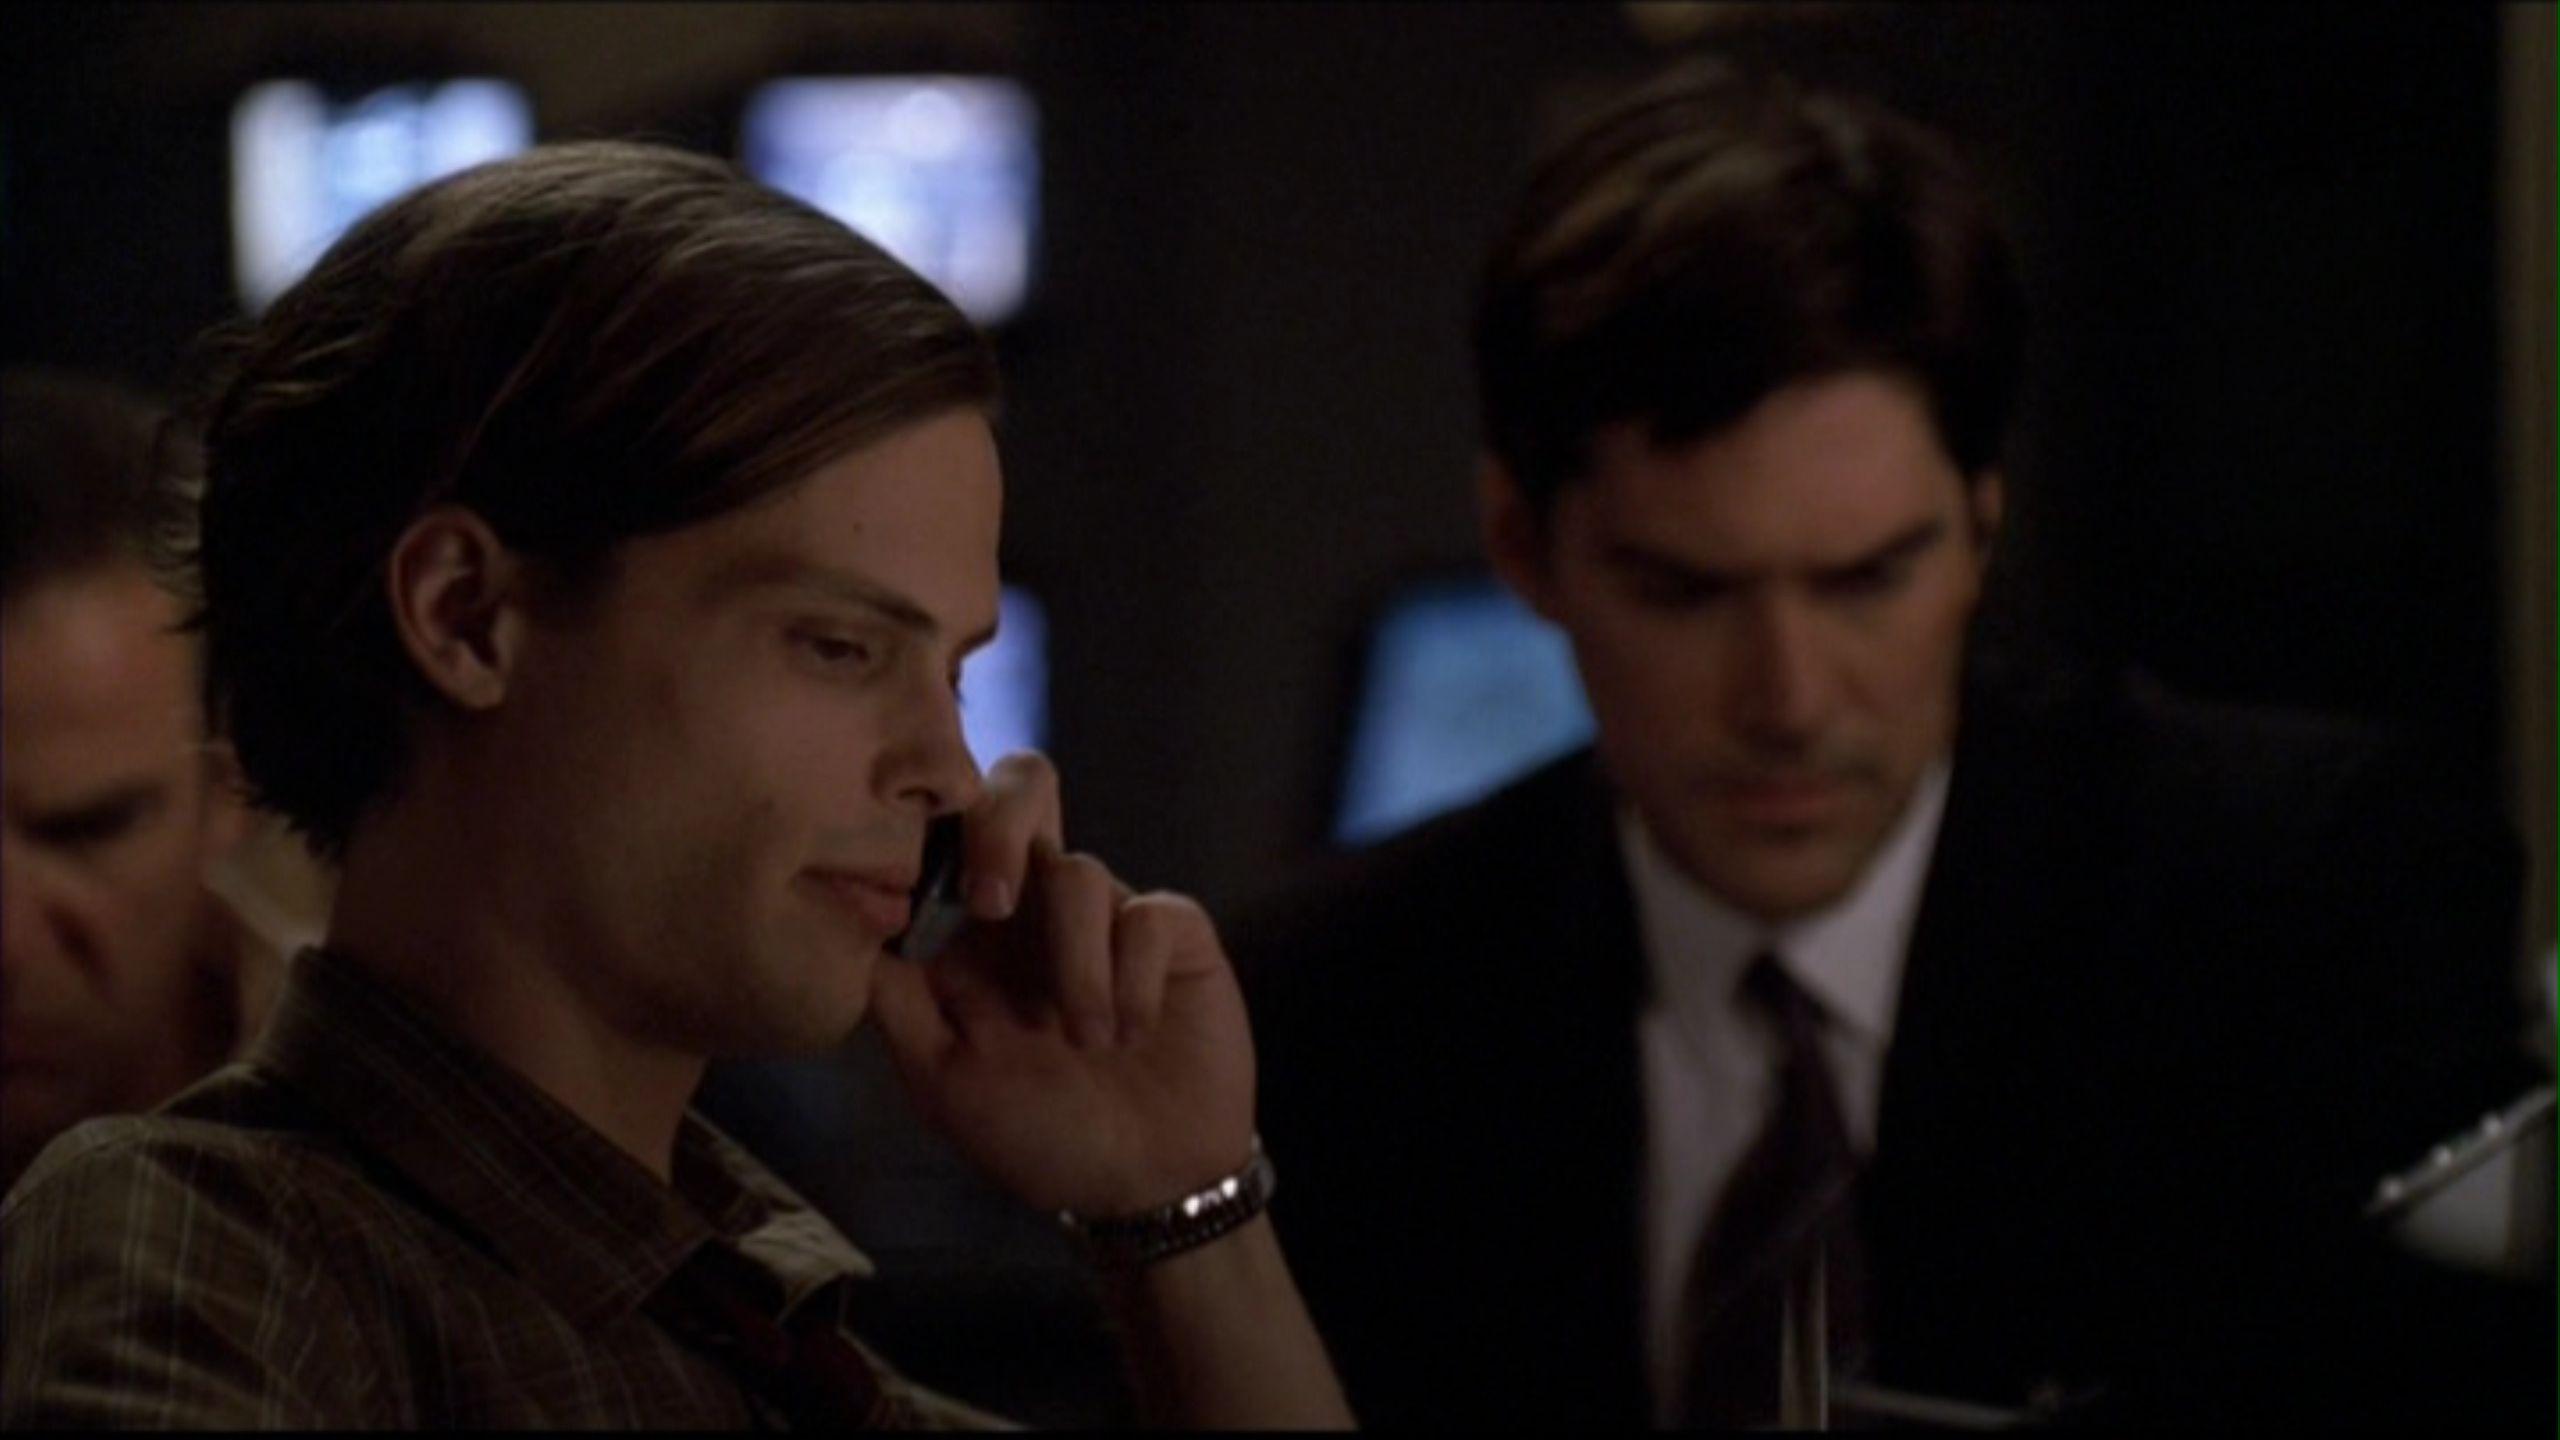 Az első évad képekben - Page 2 1x02-Compulsion-criminal-minds-25445940-2560-1440